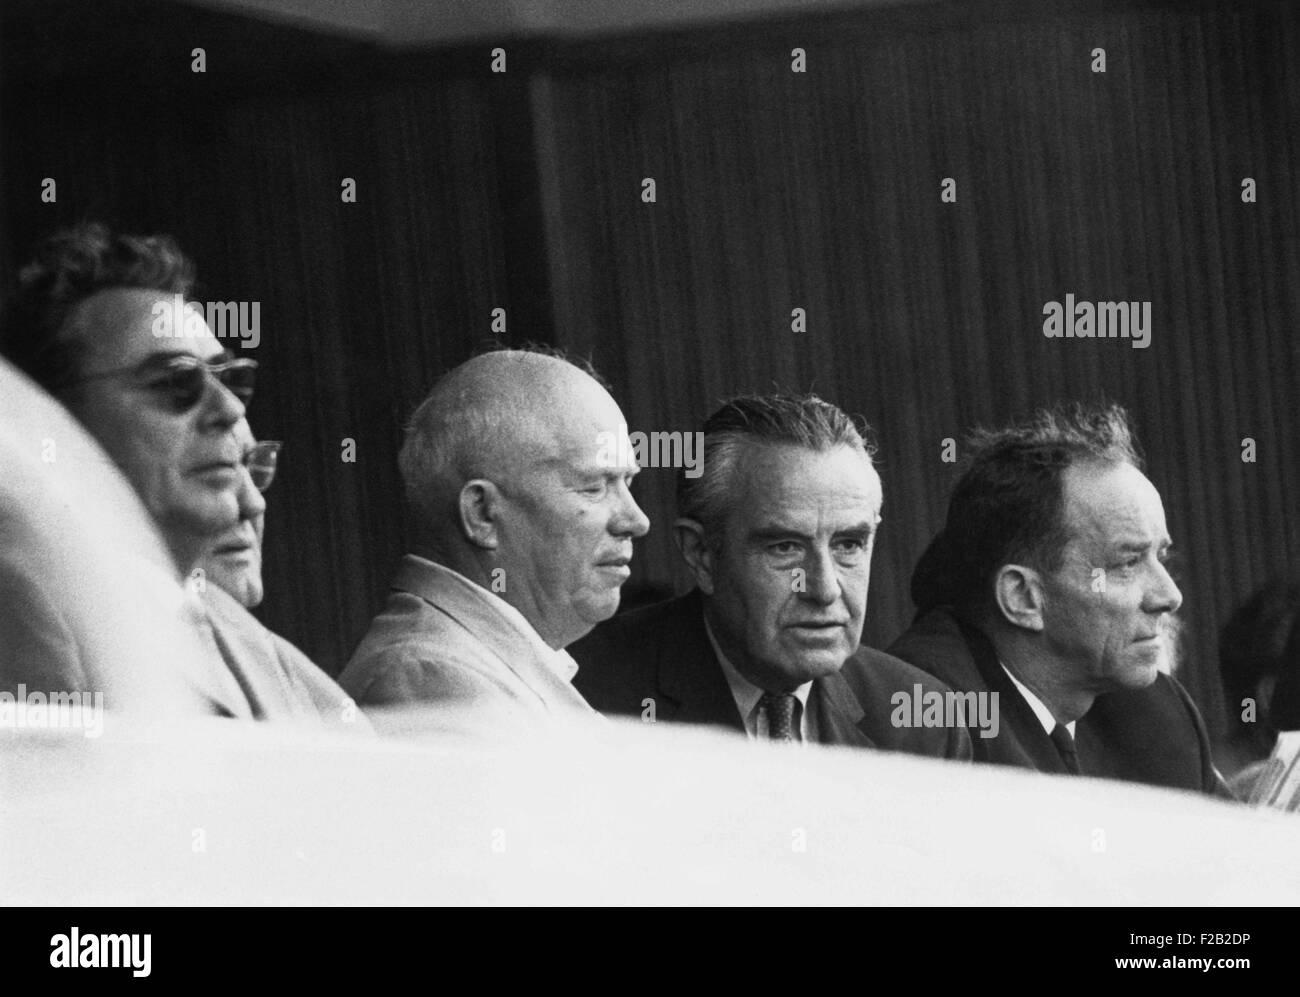 Nuclear Test Ban Treaty talks underway, July 21, 1963. Soviet Premier Nikita Khrushchev and Undersecretary of State - Stock Image